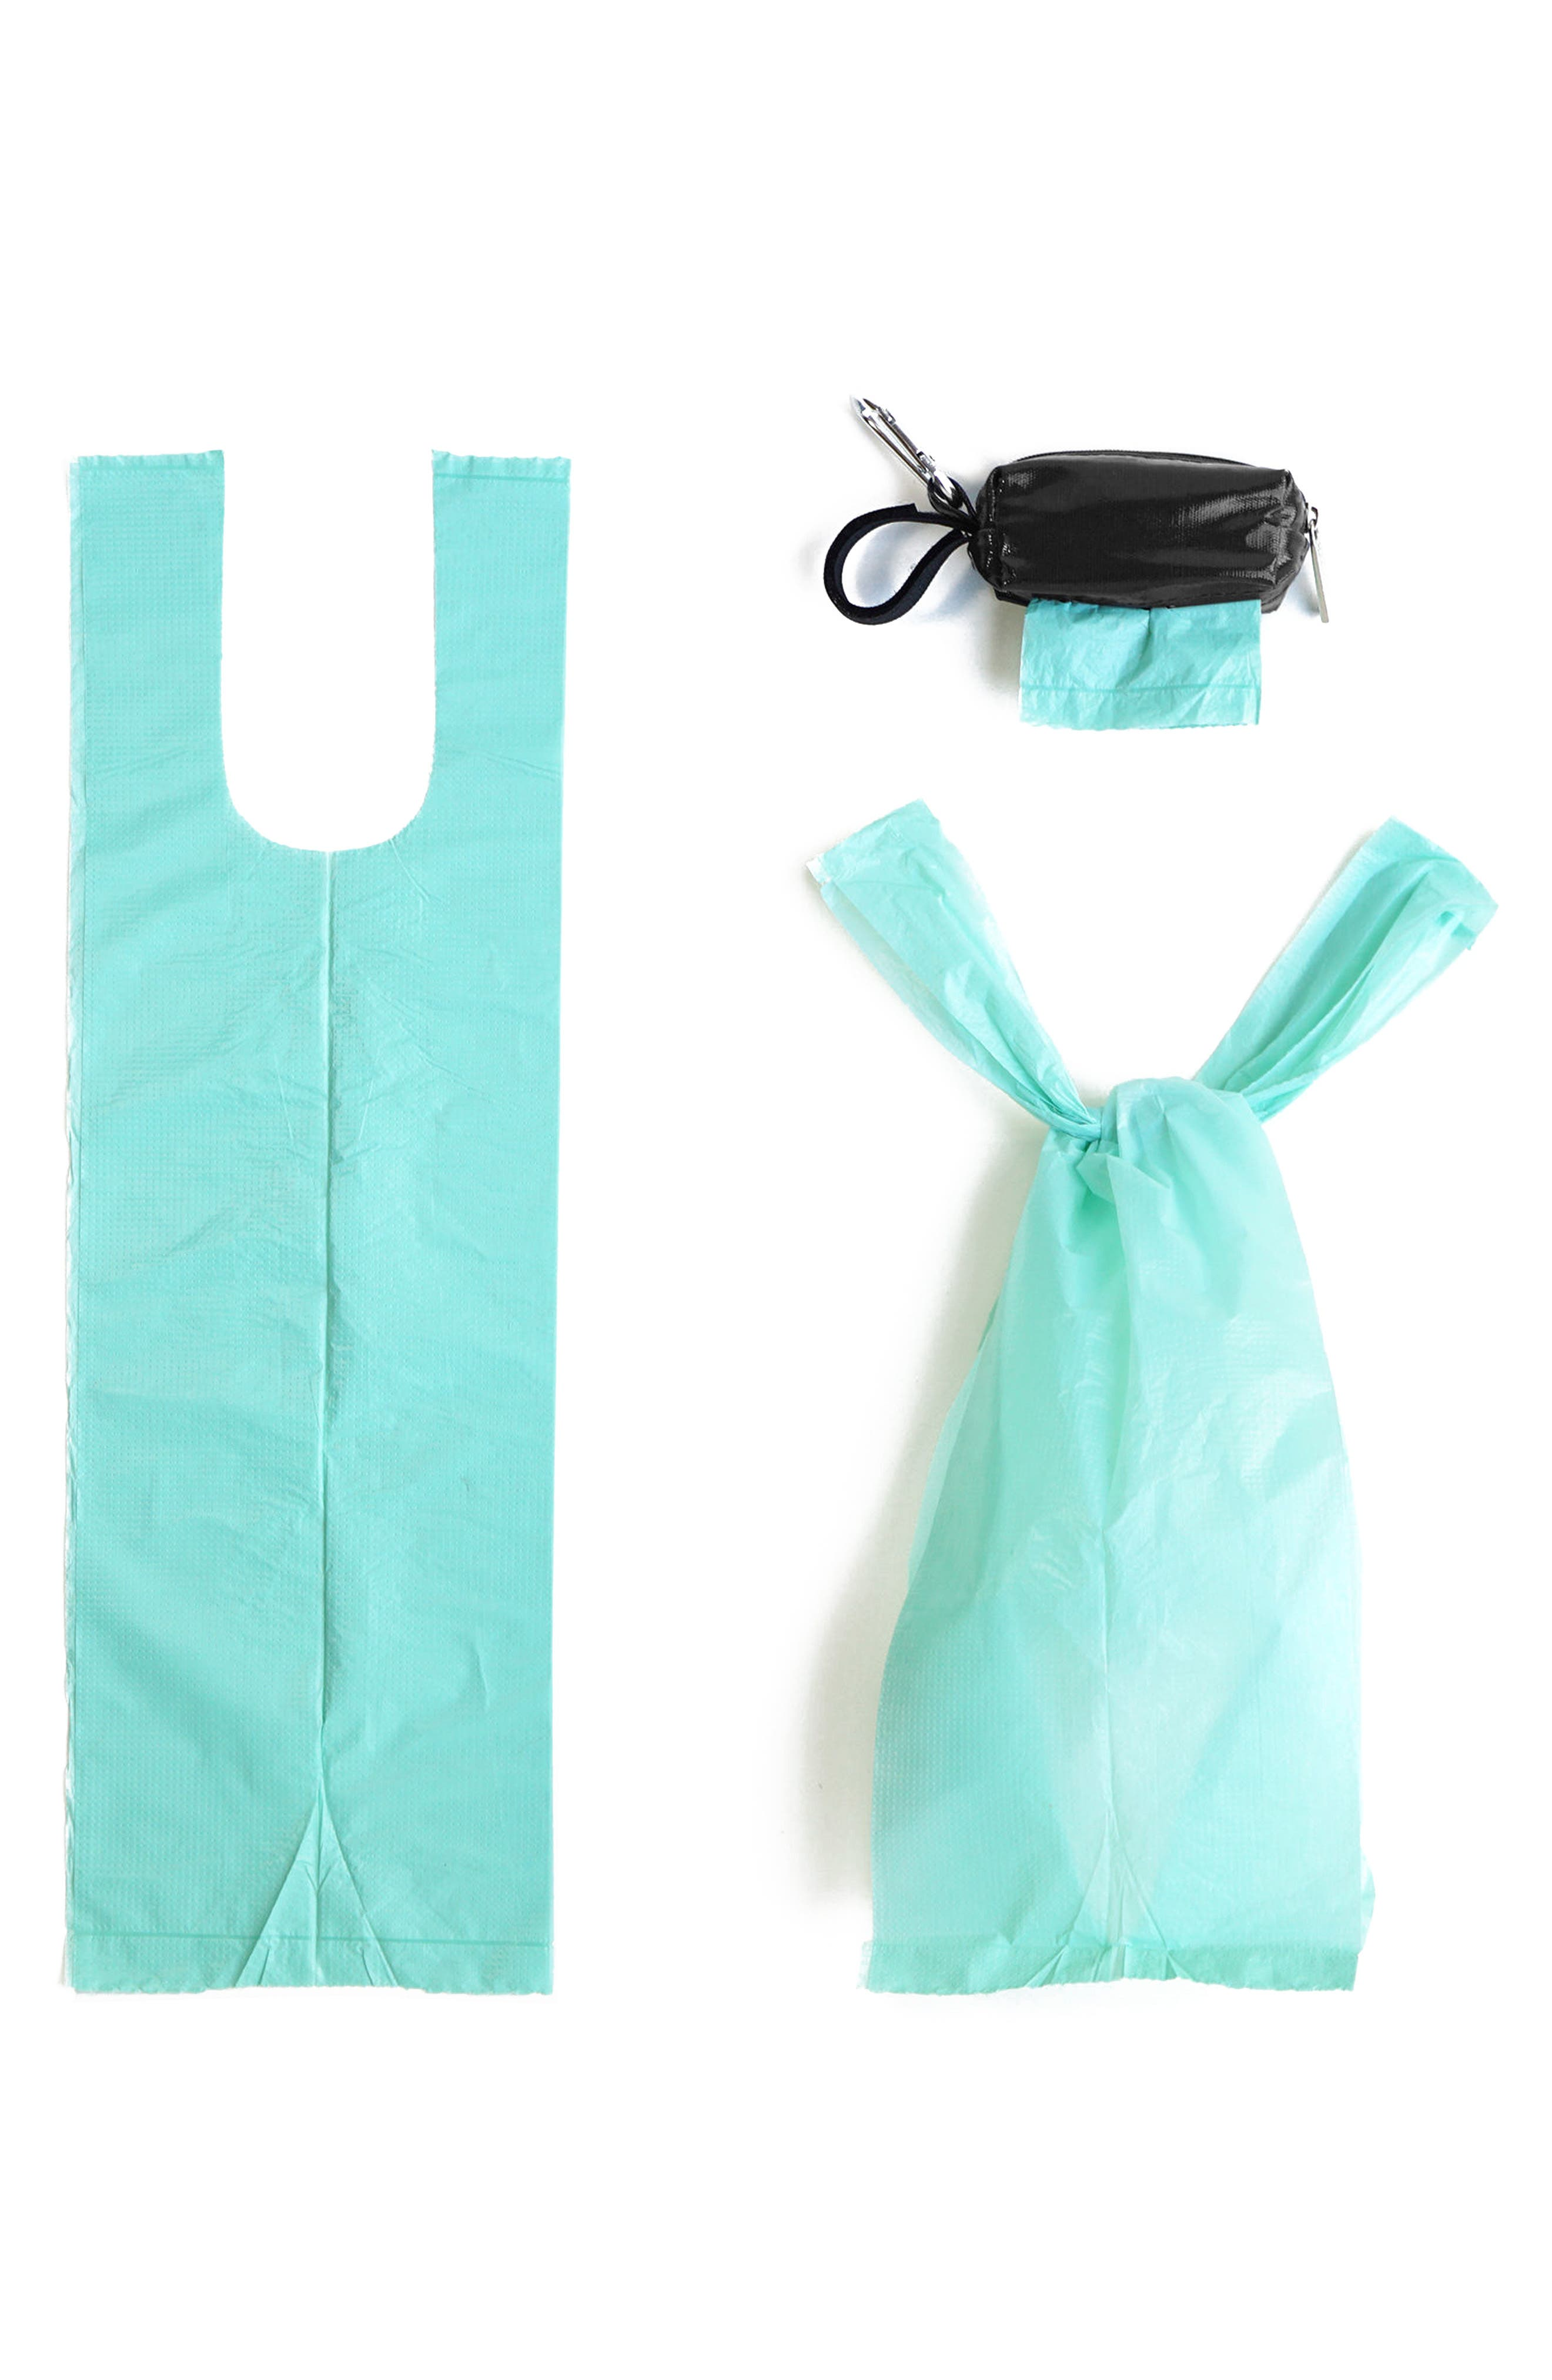 Portable Clip-On Dispenser & Bag Set,                             Alternate thumbnail 3, color,                             Black